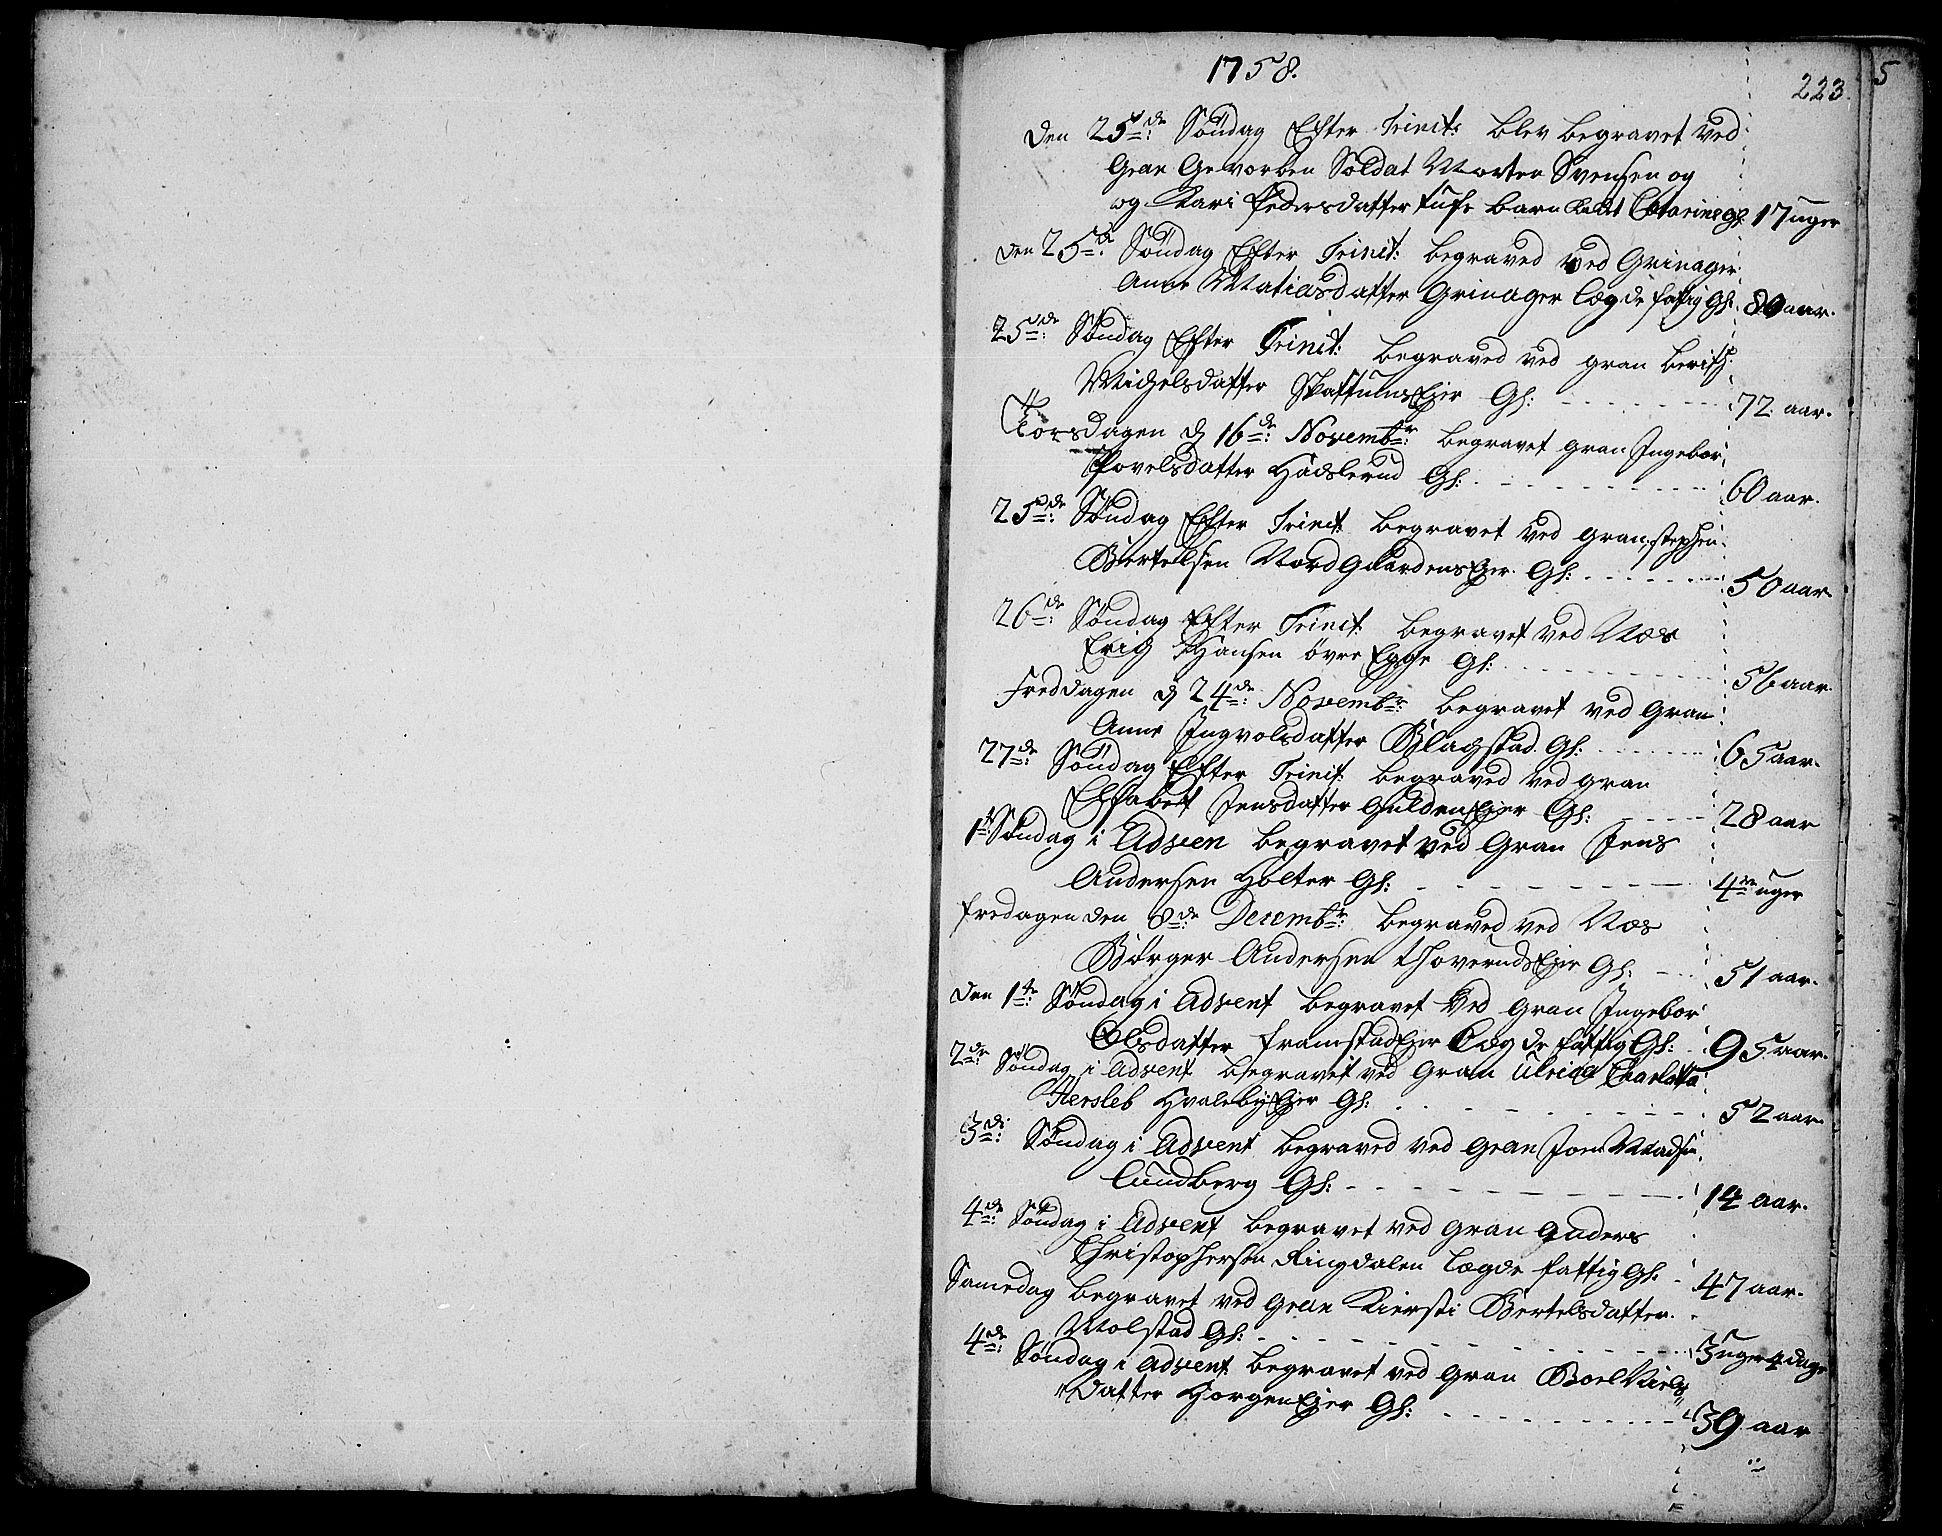 SAH, Gran prestekontor, Ministerialbok nr. 3, 1745-1758, s. 223